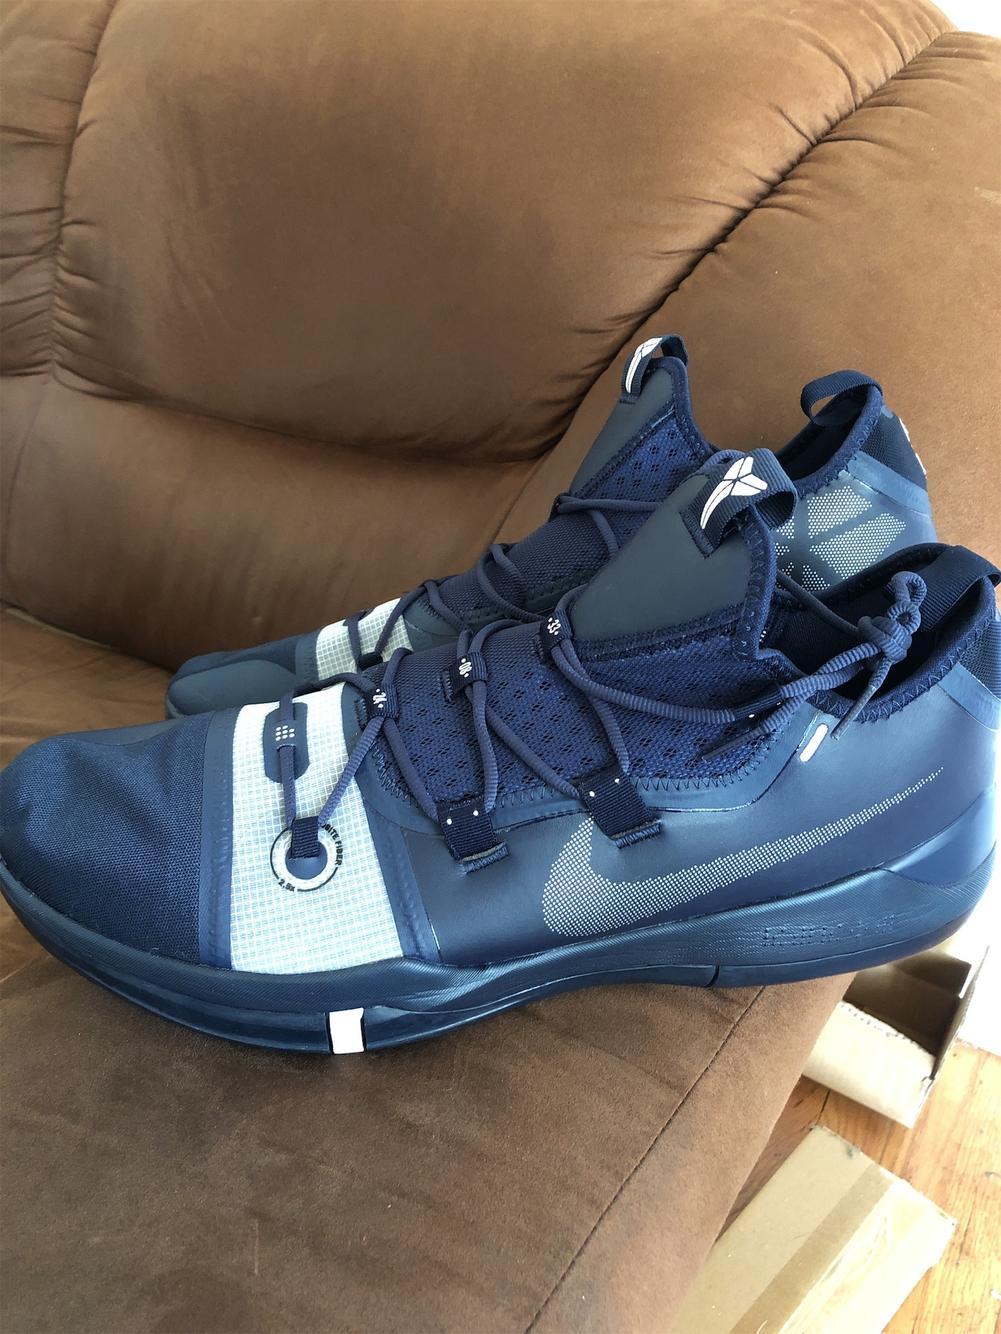 Nike Kobe AD Exodus Navy Blue Low Men's